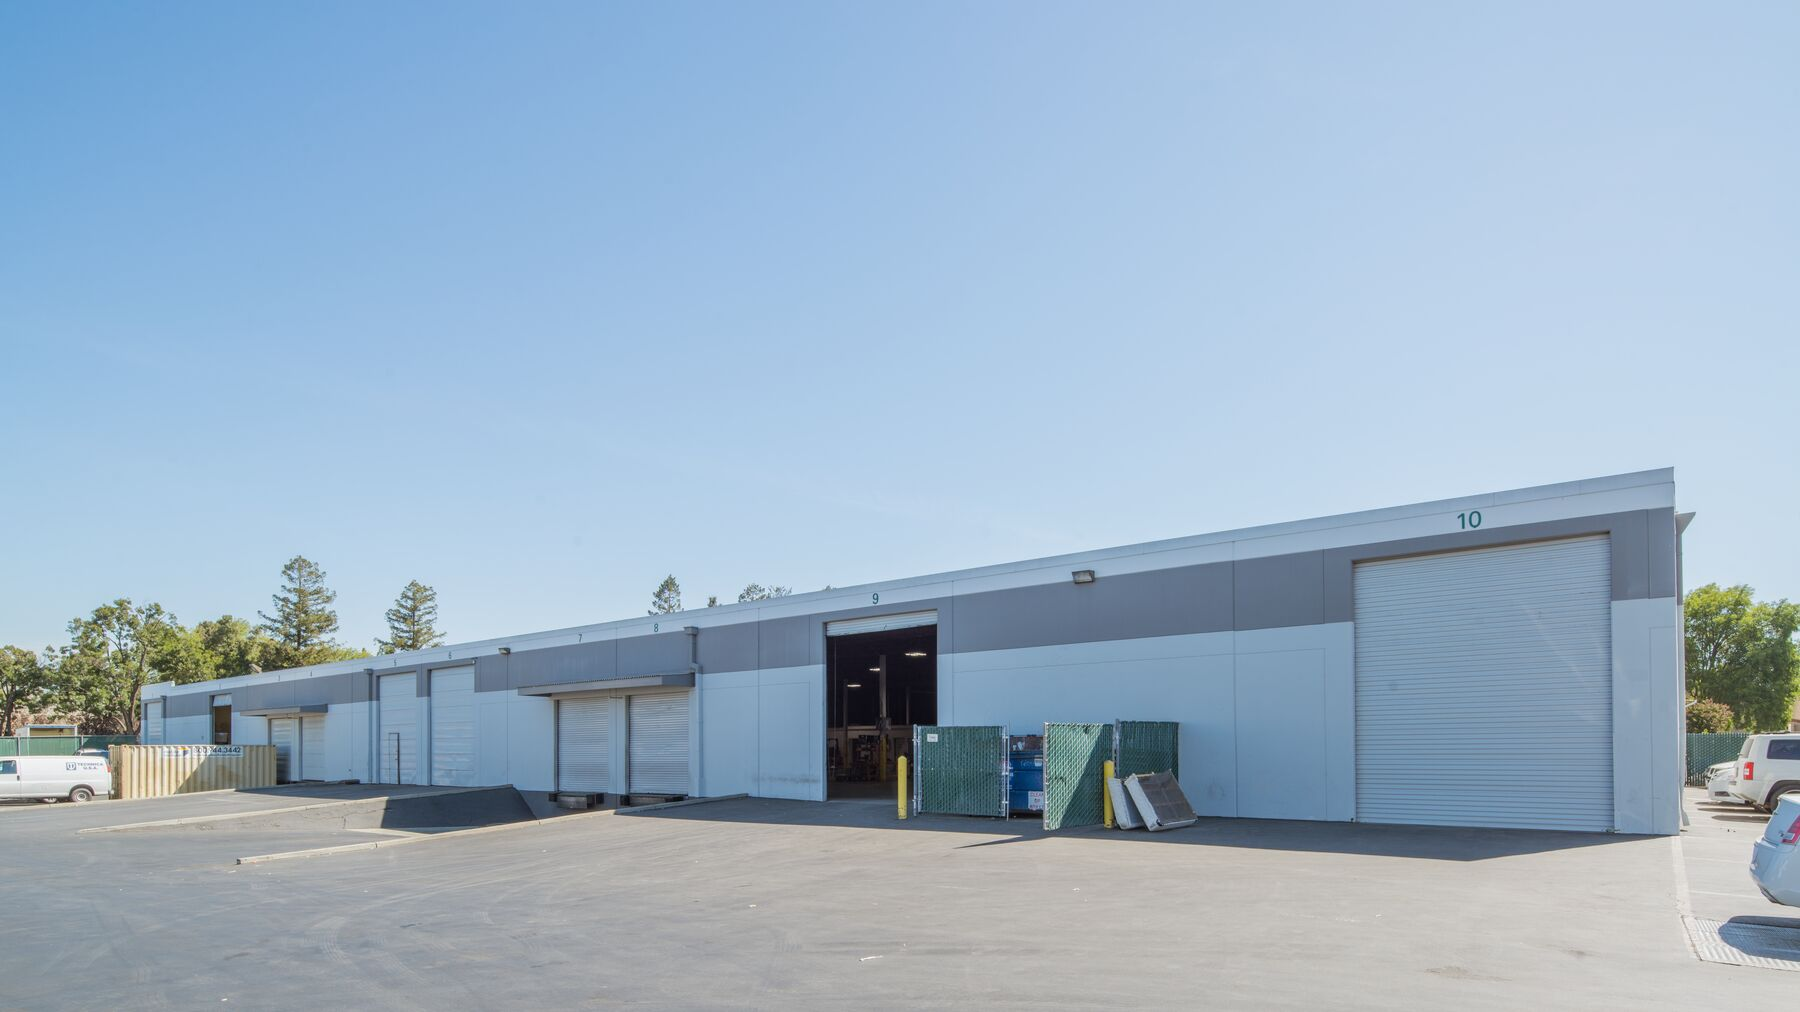 DPM-North-San-Jose-7-1.jpg